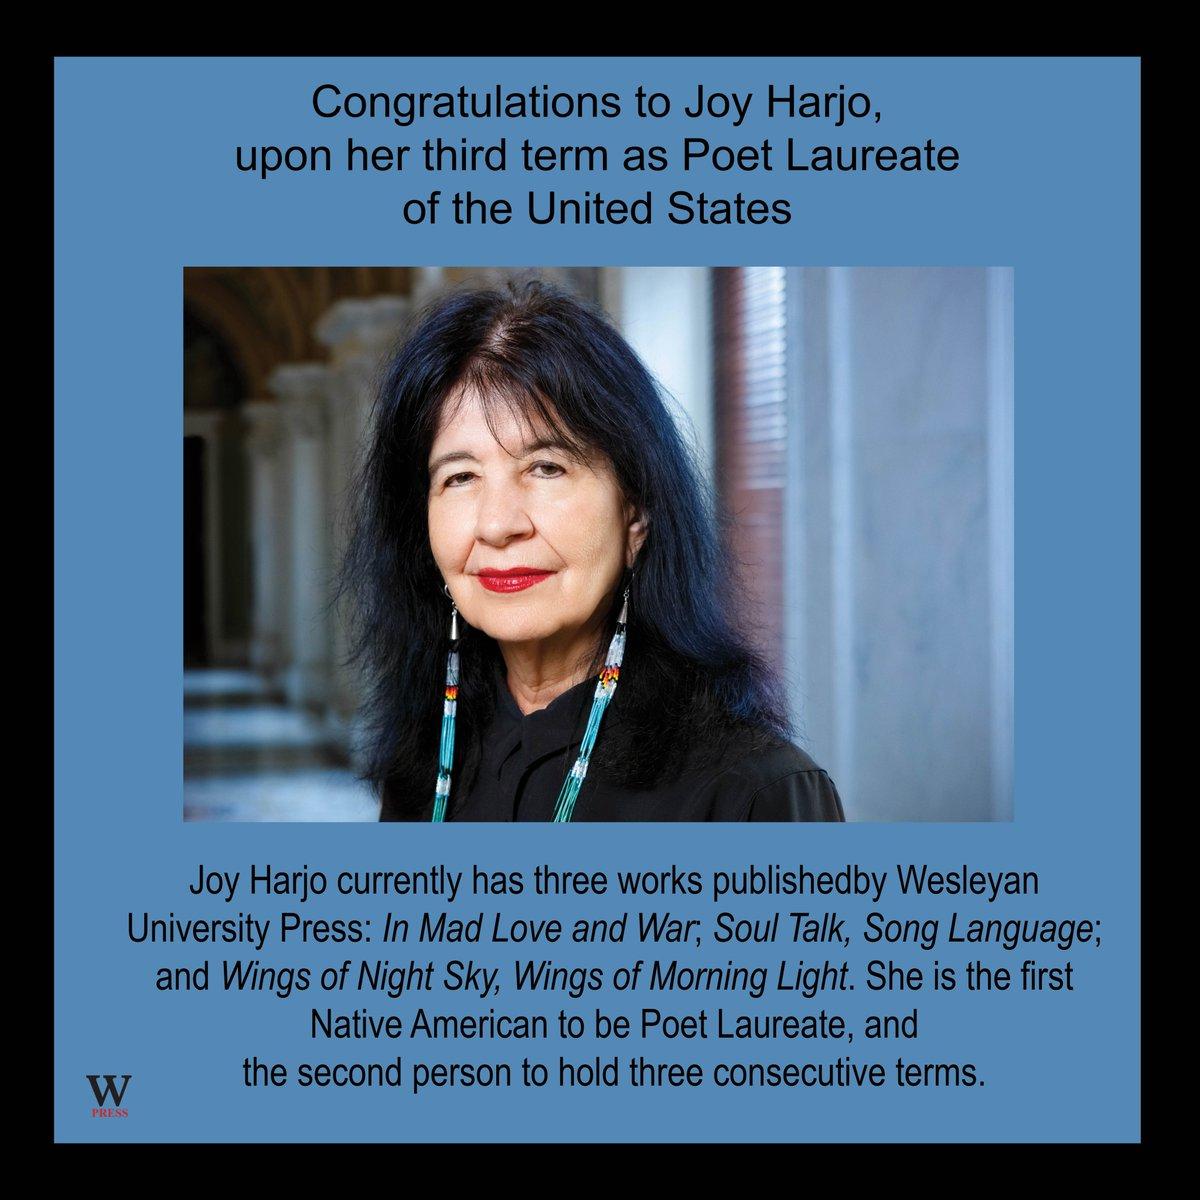 test Twitter Media - Congratulations to Joy Harjo, who is entering her third term as Poet Laureate of the United States. #PoetLaureate #AmericanPoetry #NativePoetry #NativeTheater #AmericanTheater @JoyHarjo @librarycongress https://t.co/4NAALZ3EKz